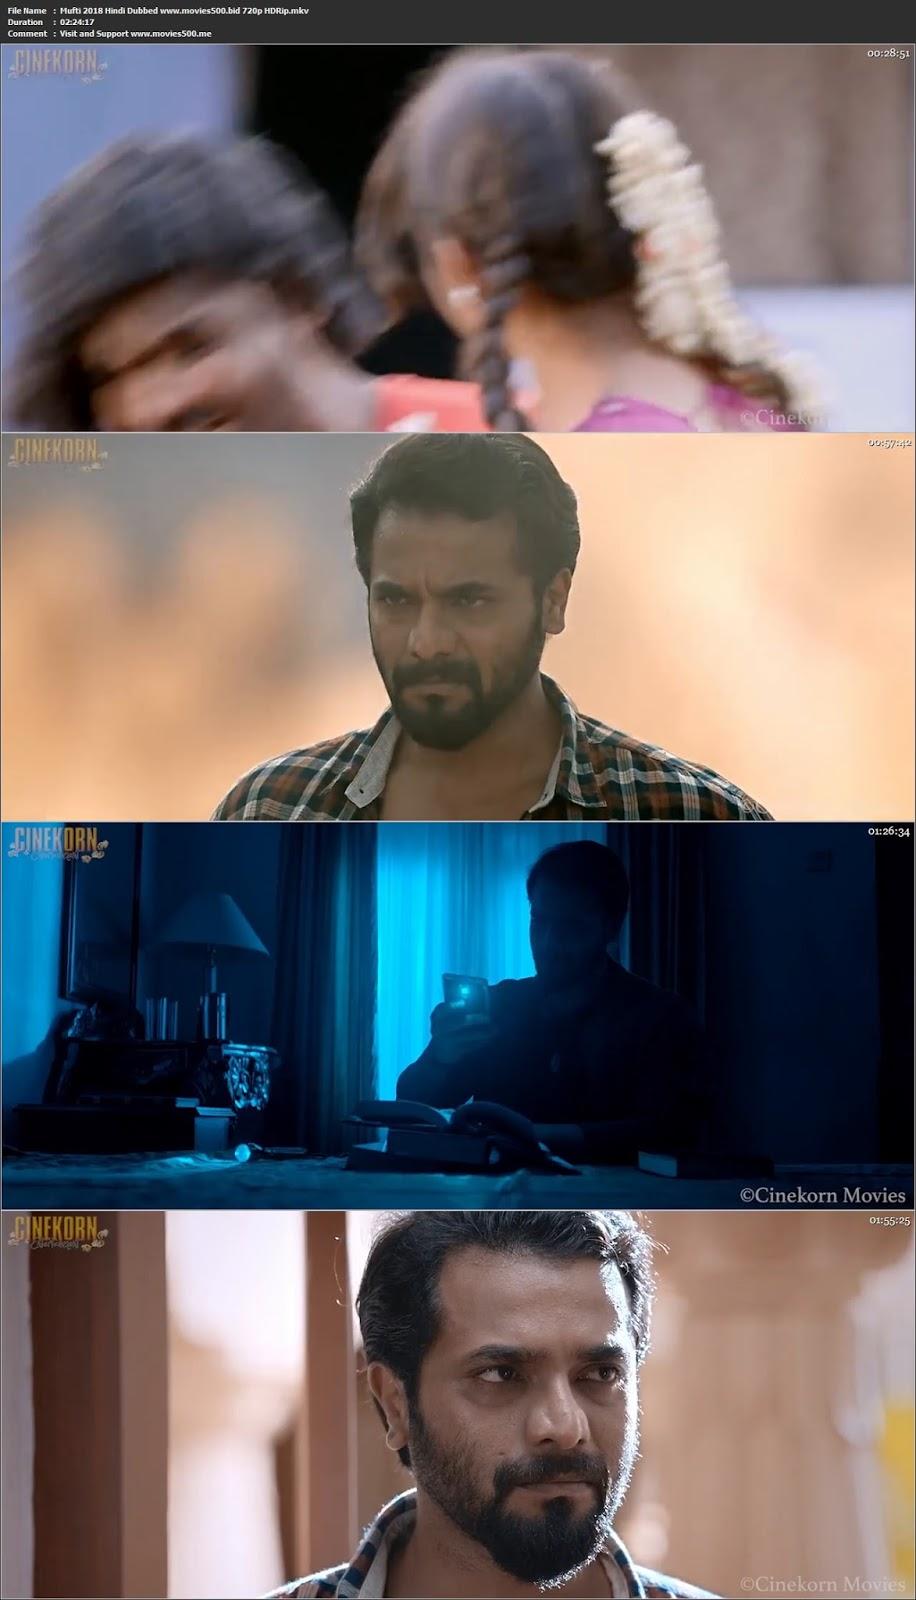 Mufti 2018 Hindi Dubbed Full Movie HDRip 720p at 9966132.com